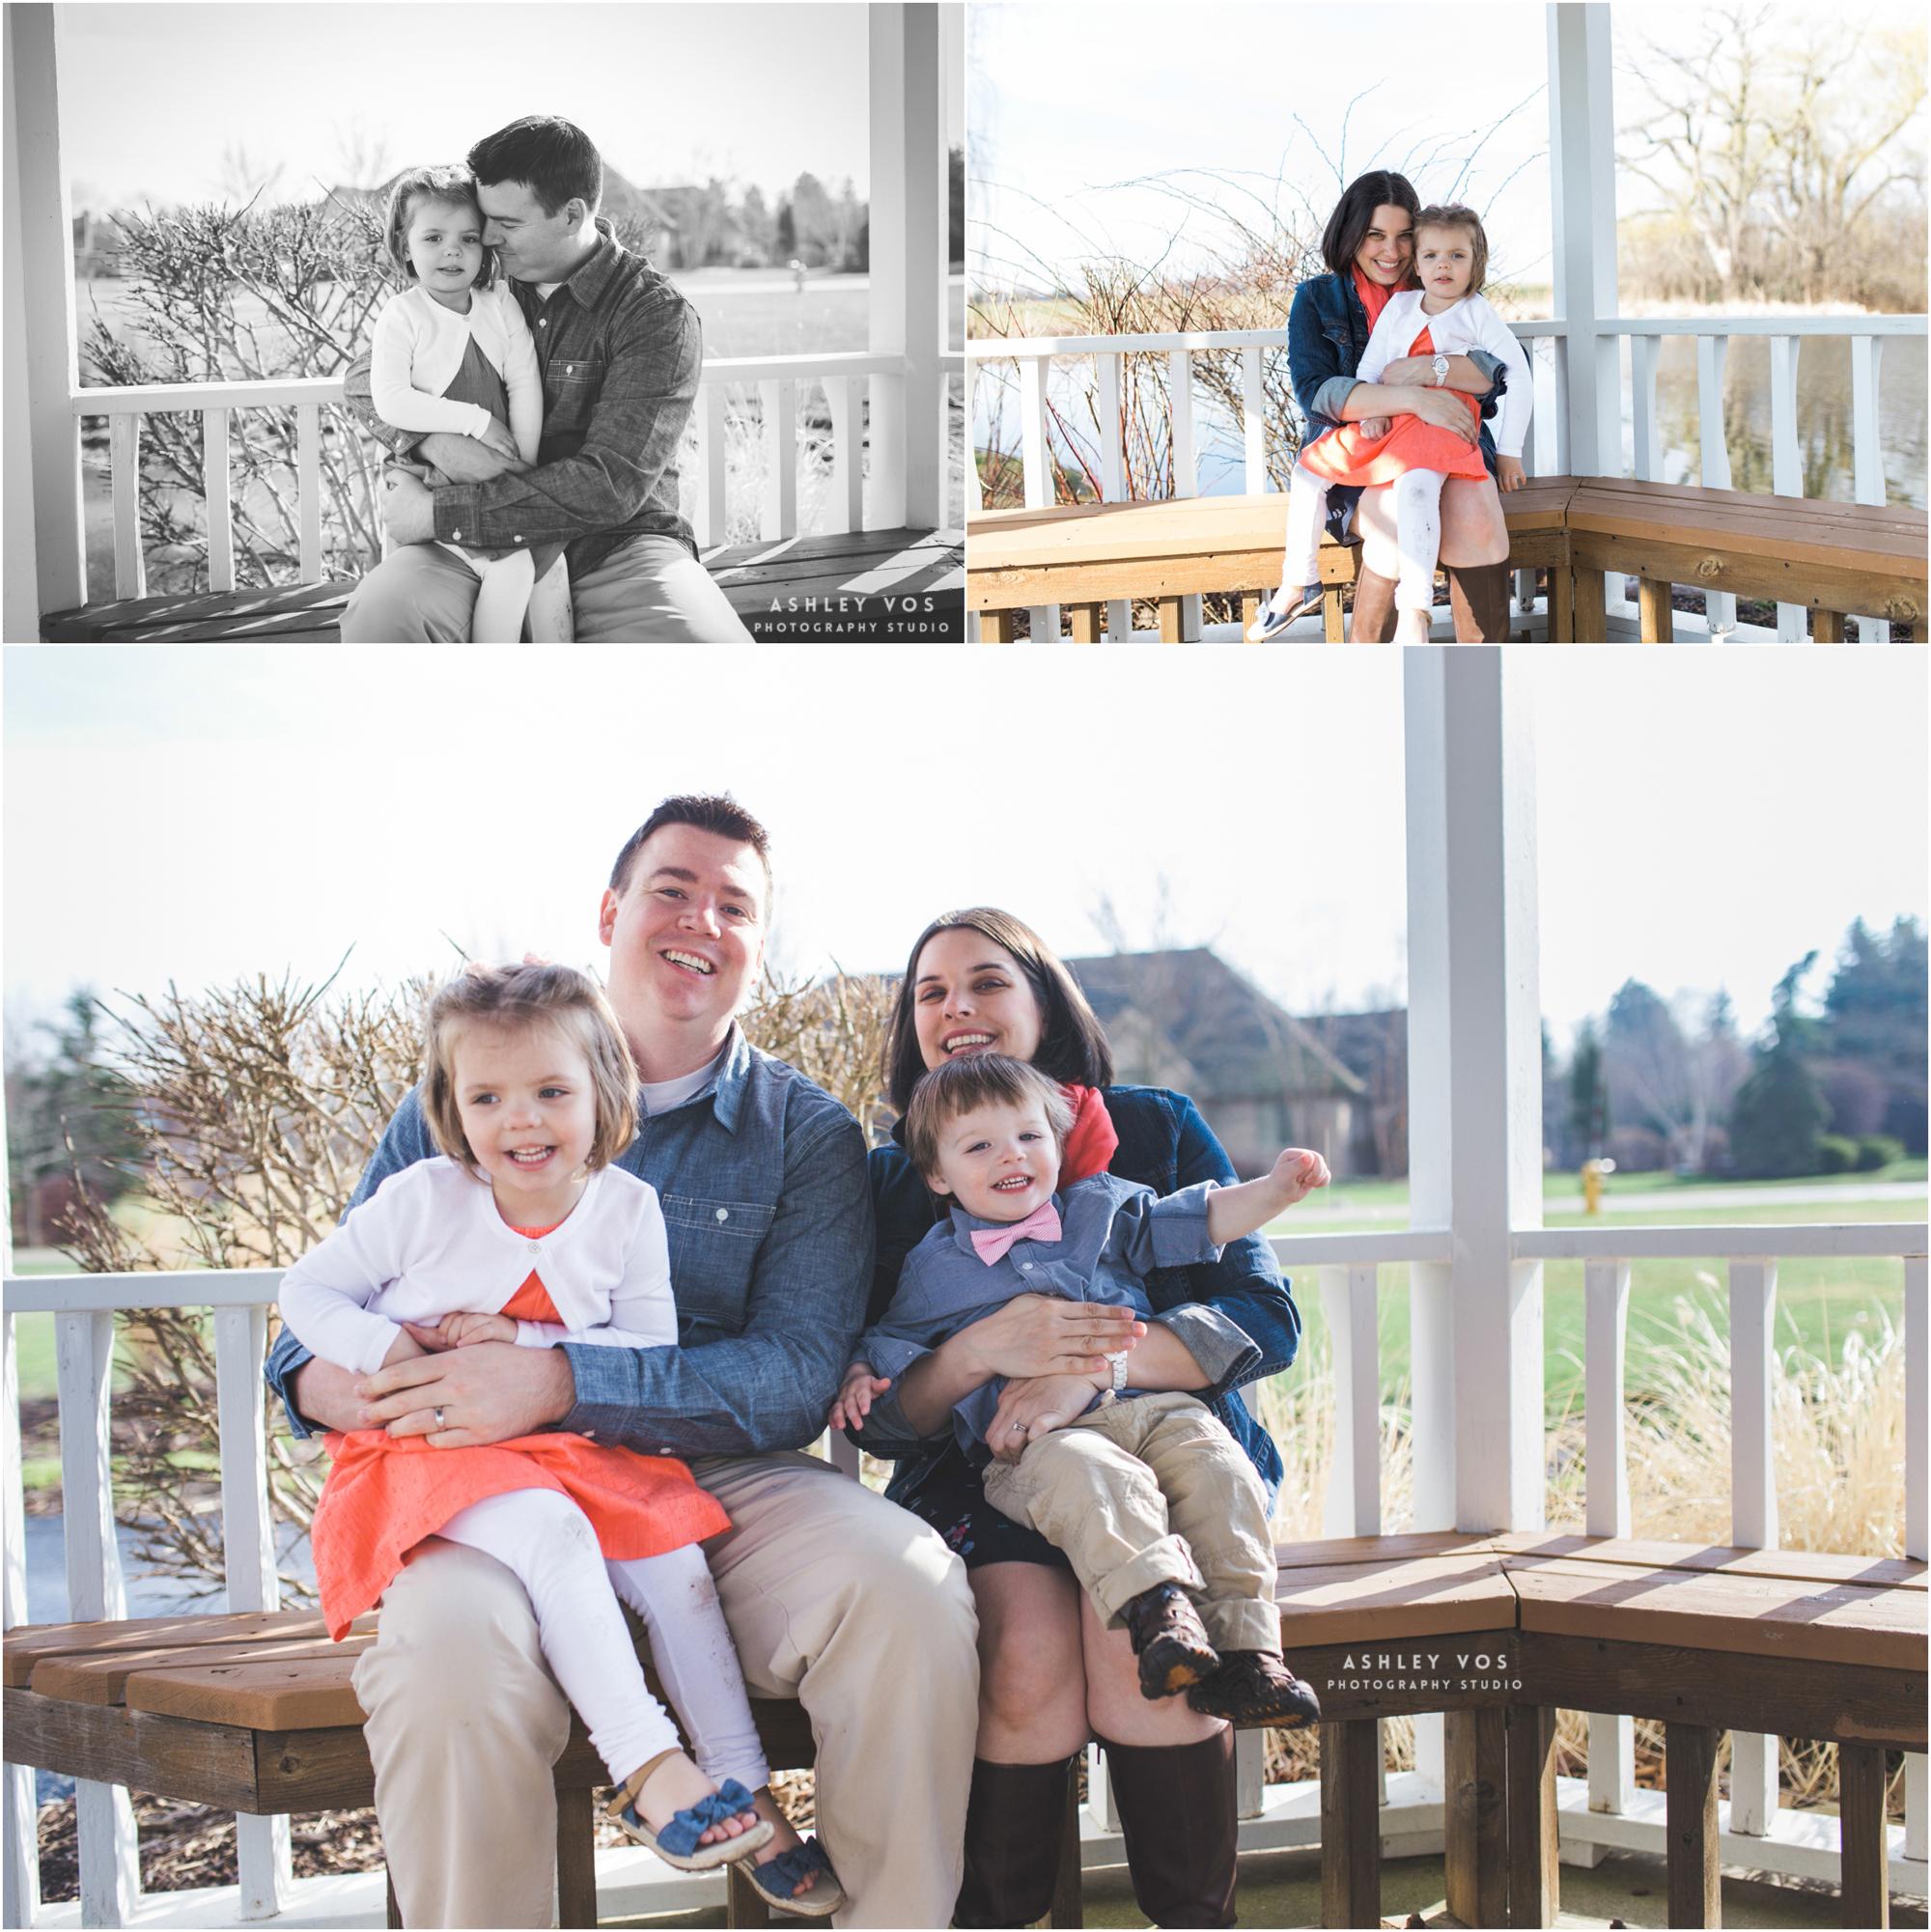 Ashley Vos Photography Seattle Lifestyle Family Photography_0034.jpg